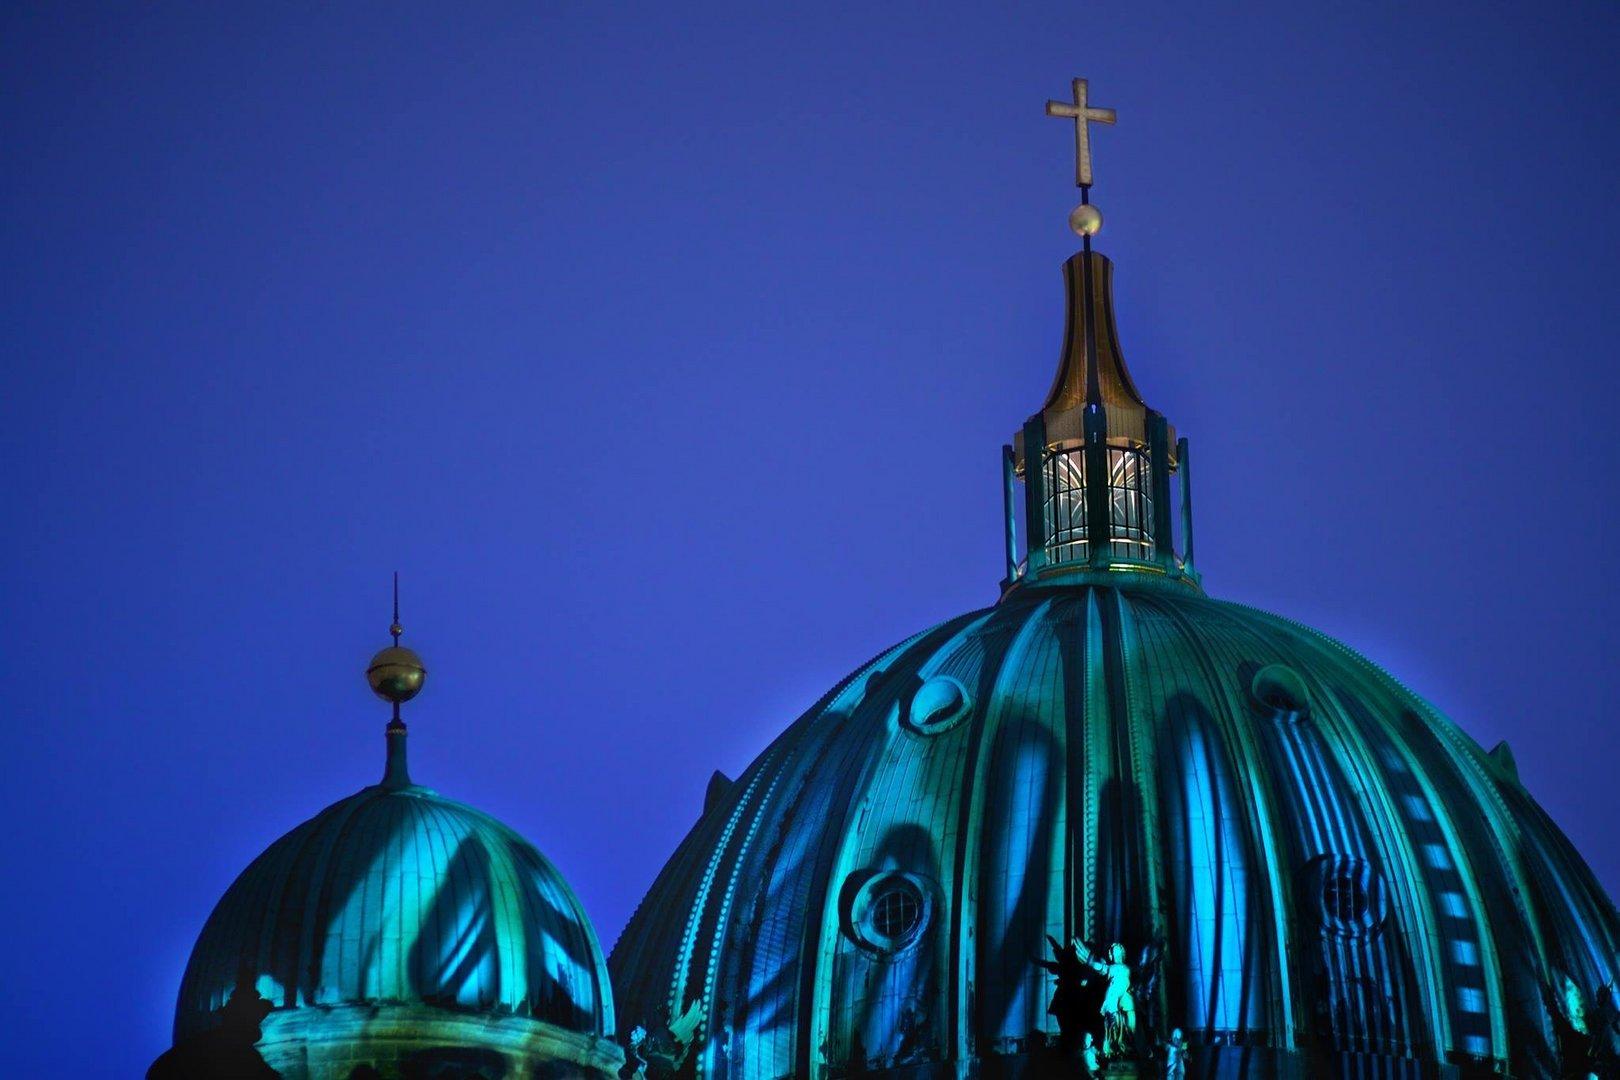 Dome of Berlin